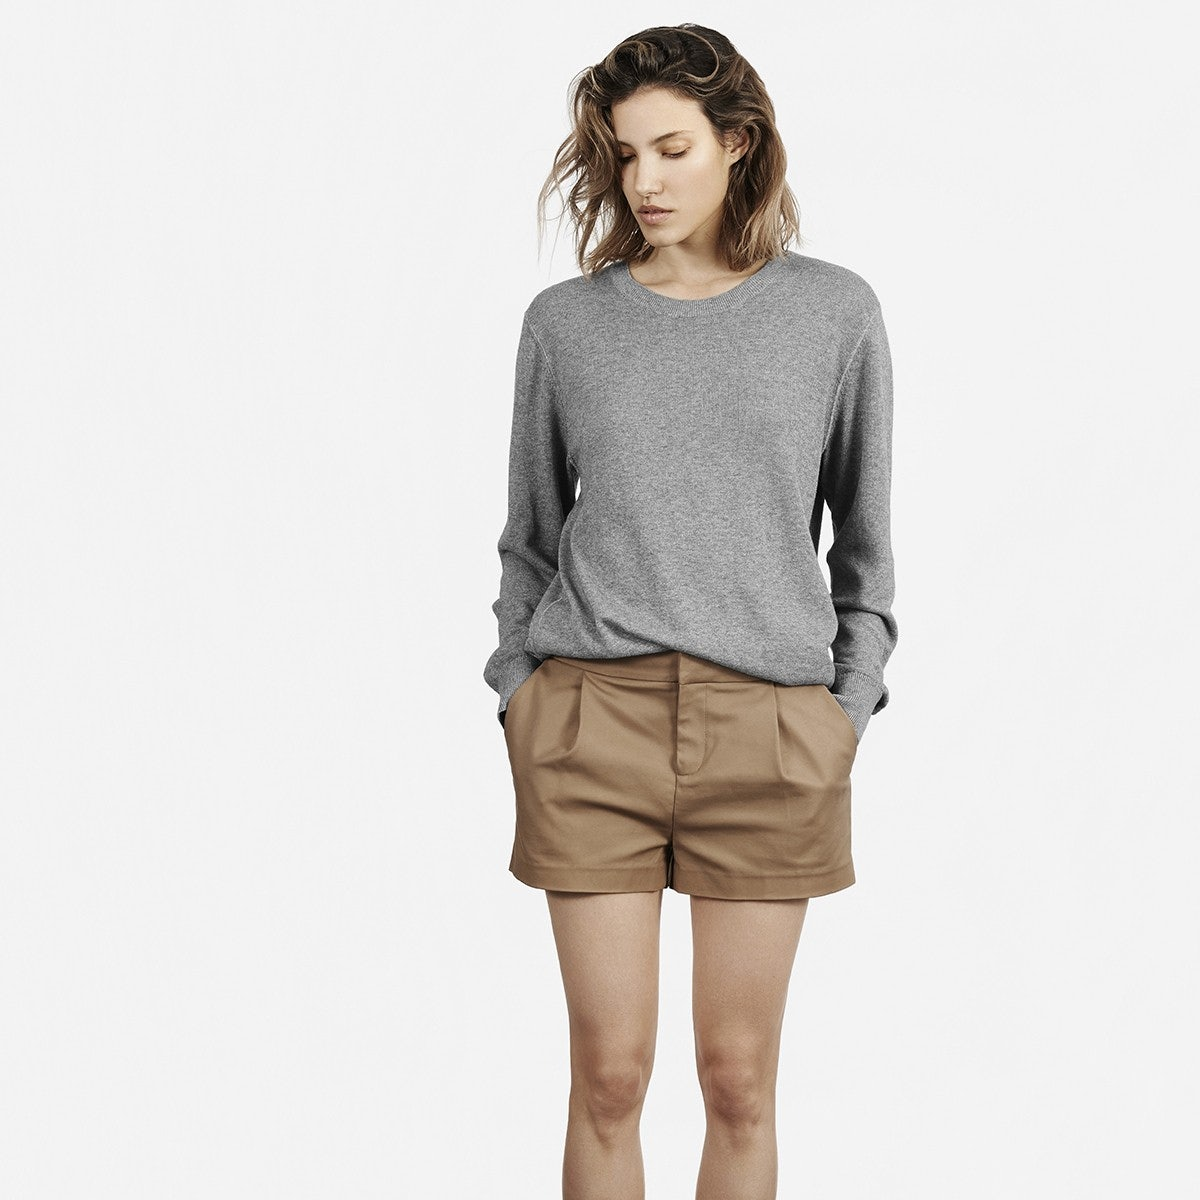 The Pleated Short in Hazel